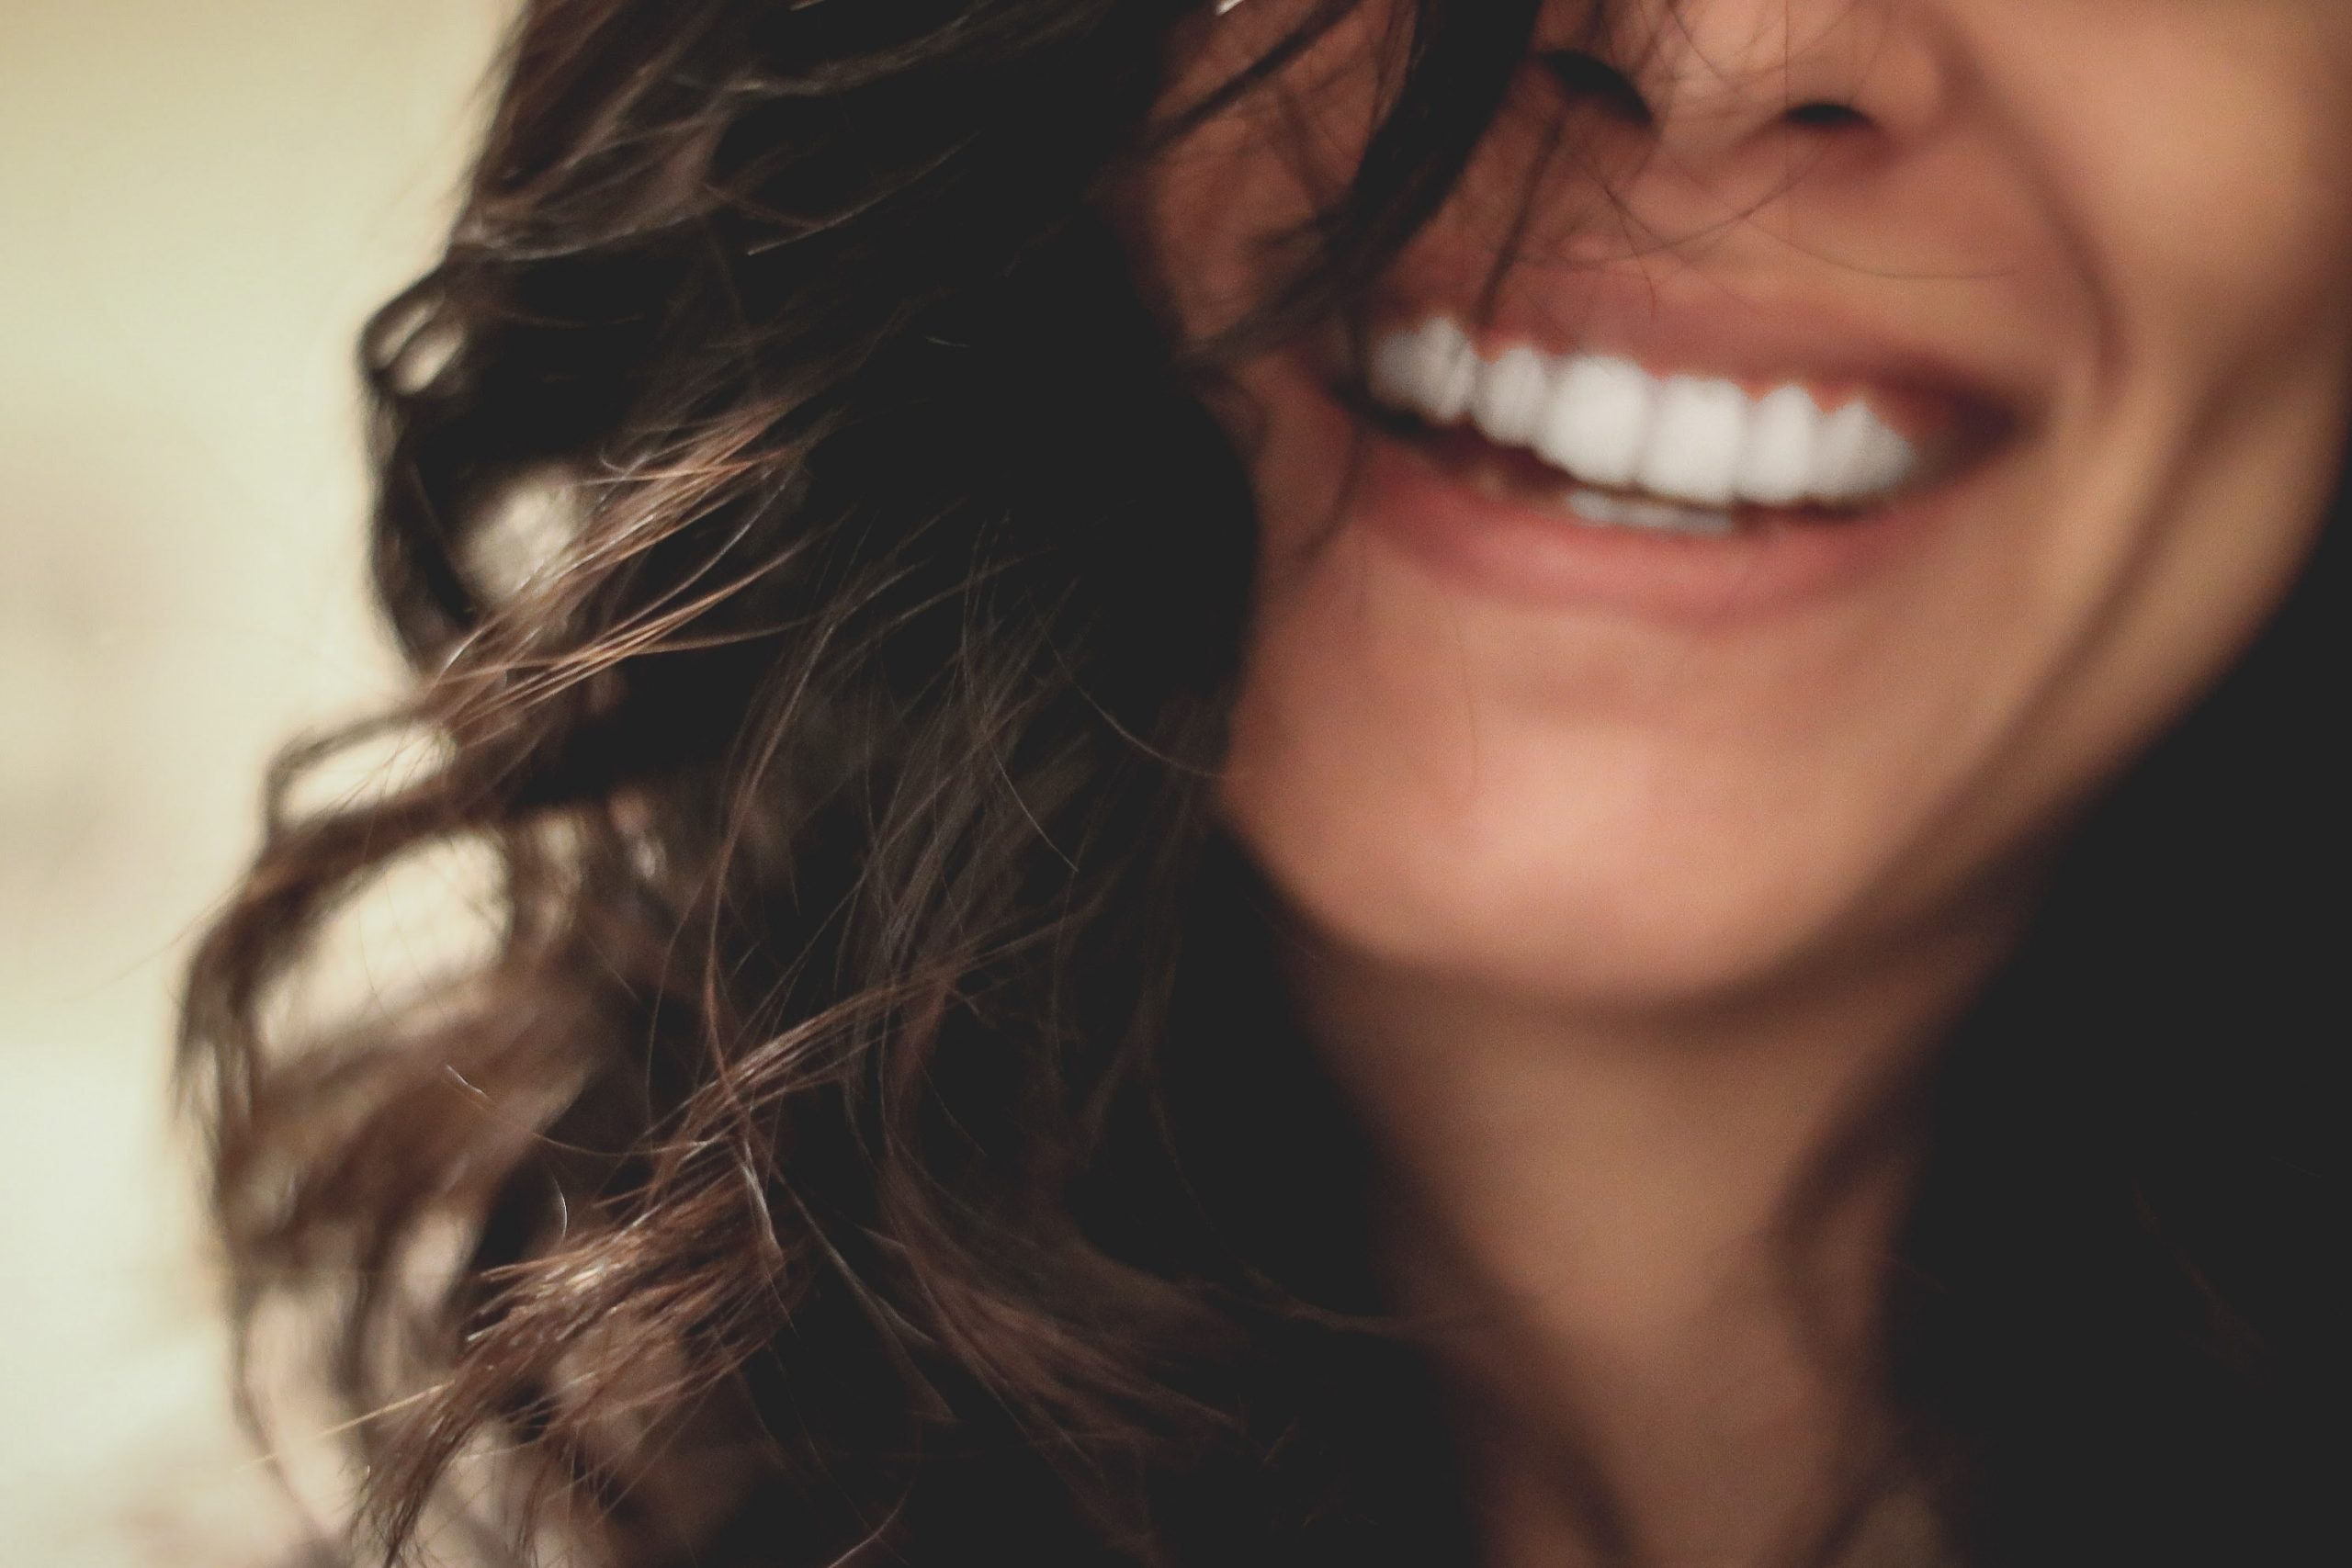 chica con dentadura limpia